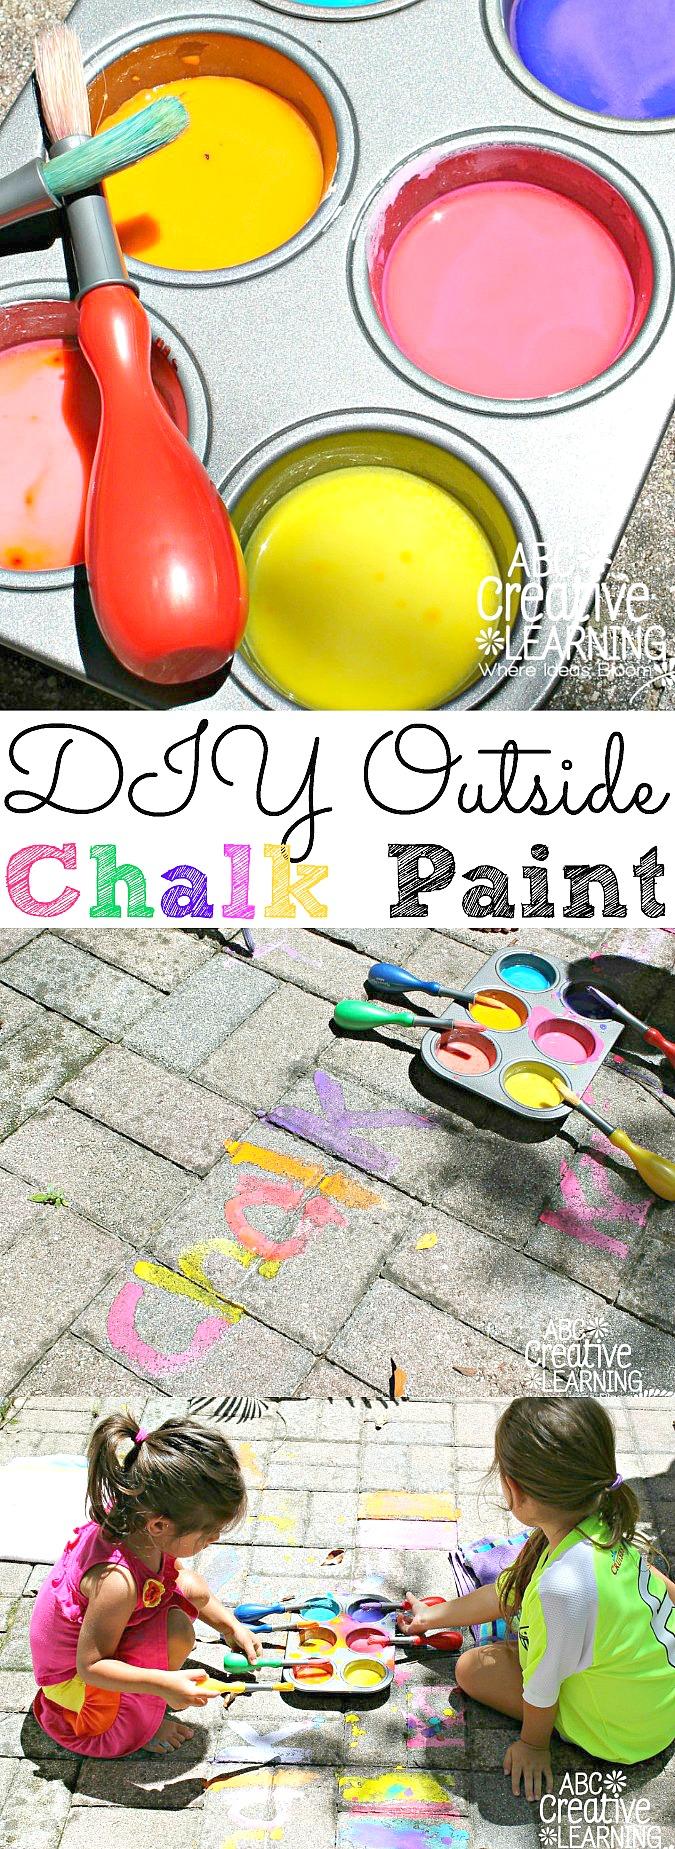 DIY Outside Chalk Paint For Kids - simplytodaylife.com